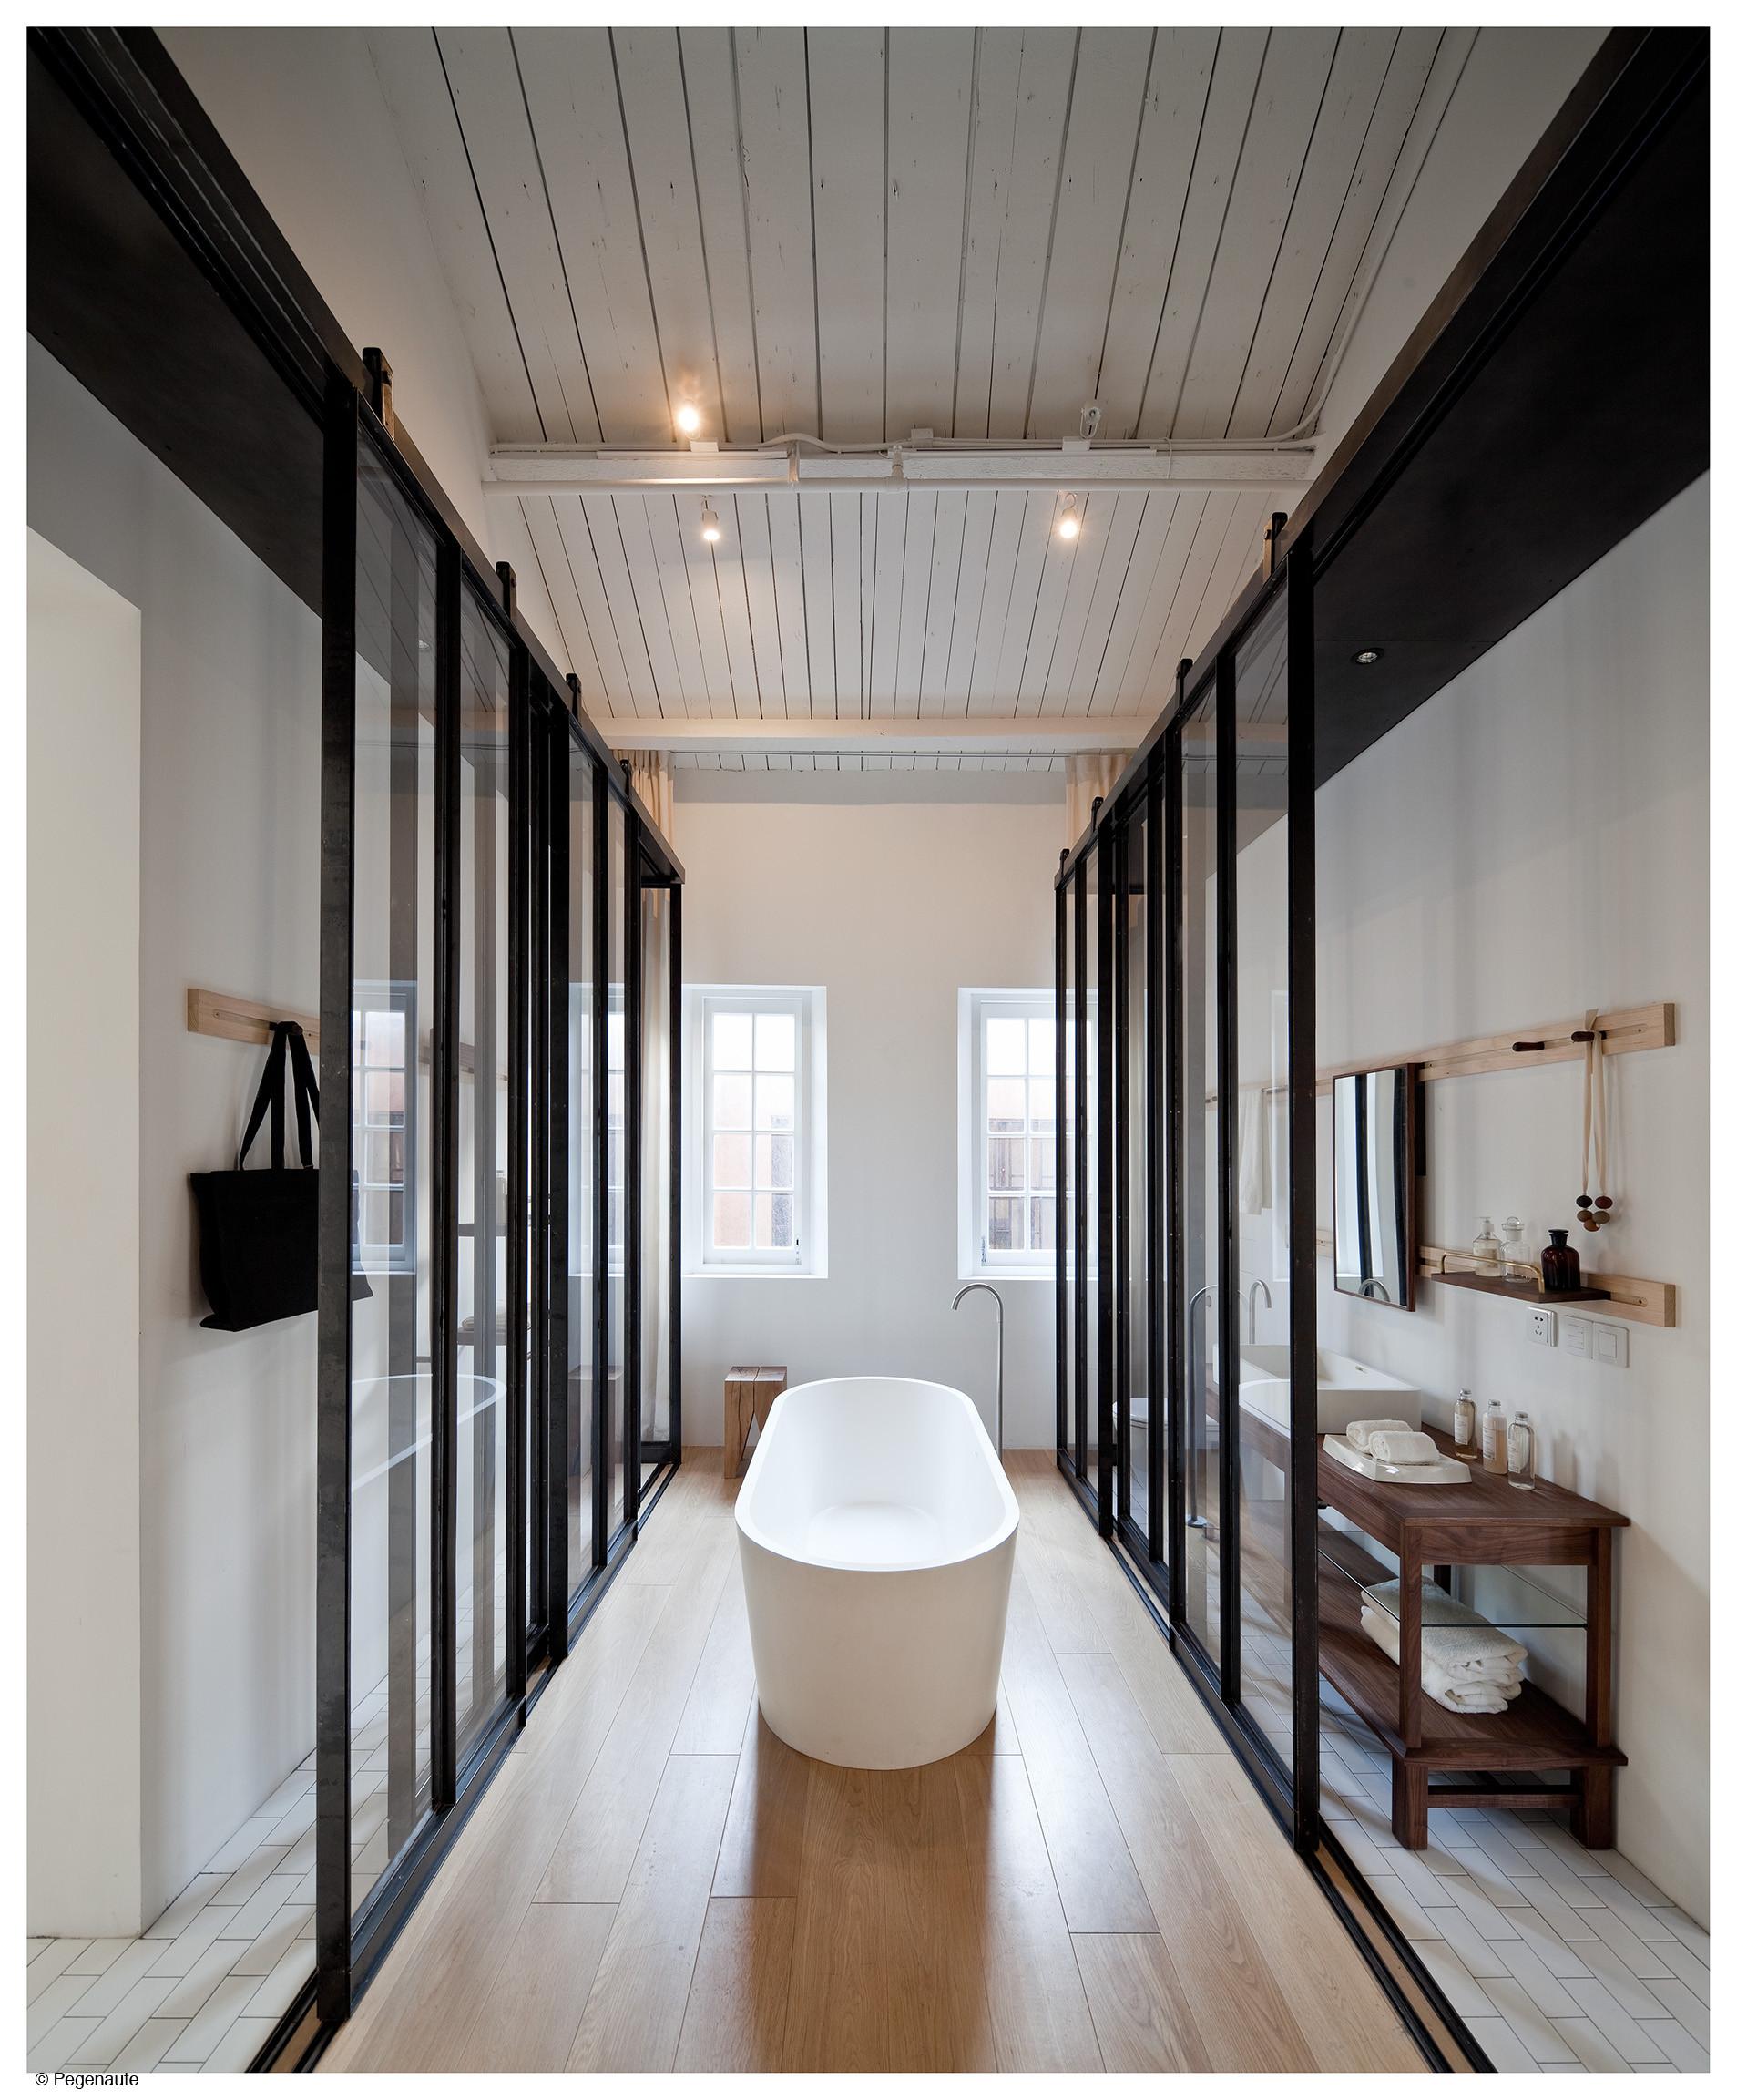 Gallery of design republic design commune neri hu design R house architecture research office